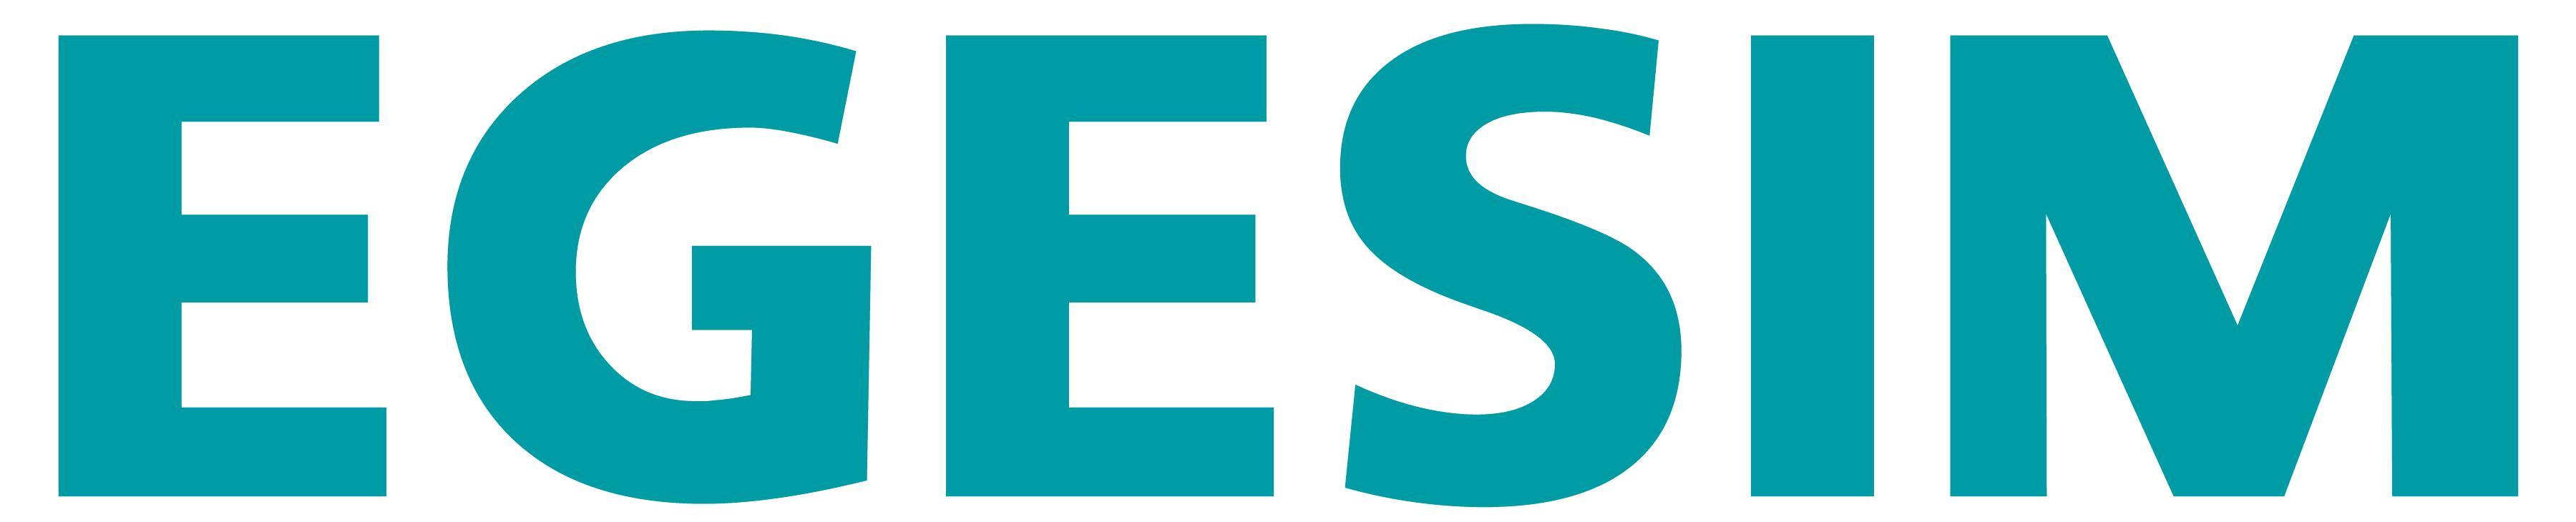 Egesim Enerji Elektromekanik ve Elektrik Taahhüt San. Tic. Ltd. Şti.